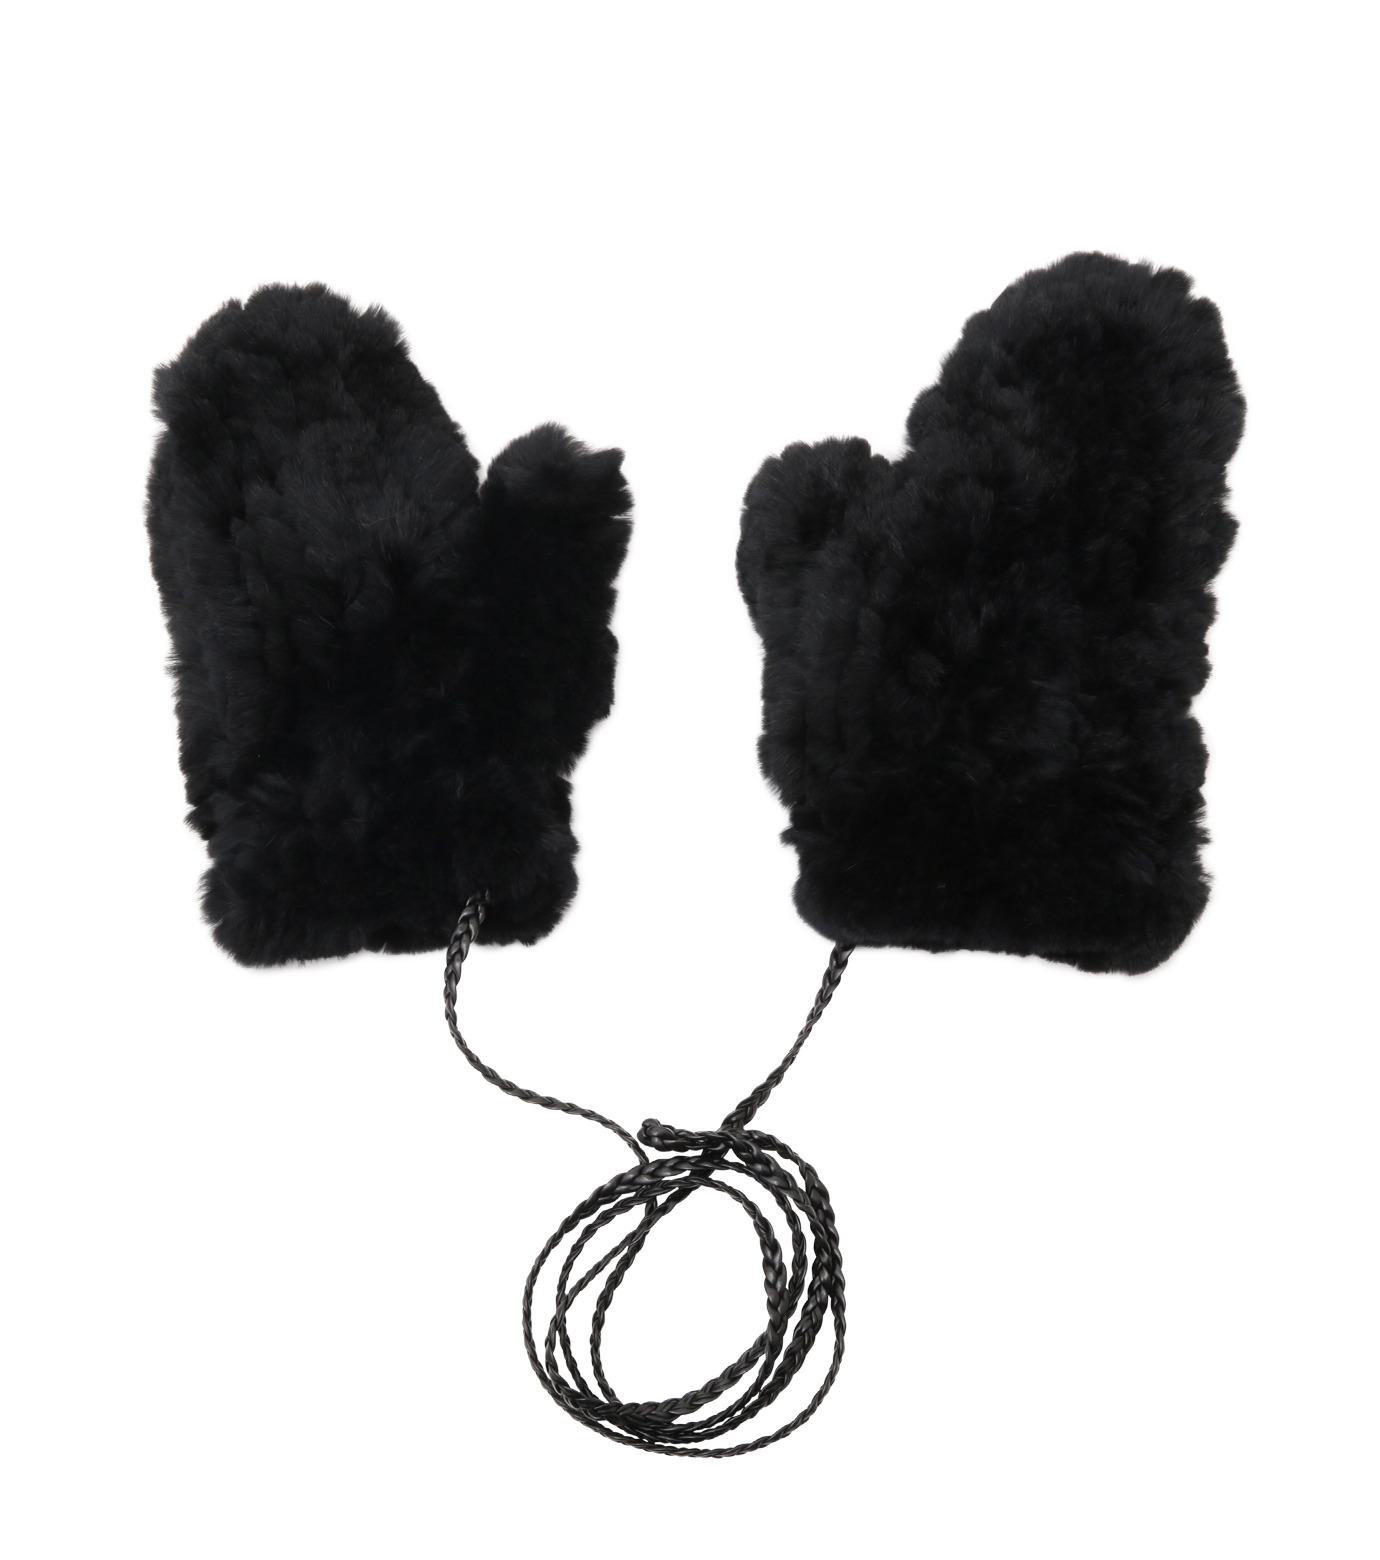 Yves Salomon(イヴ サロモン)のMitten-BLACK(アクセサリー/accessory)-Y5852XXKRE-13 拡大詳細画像1